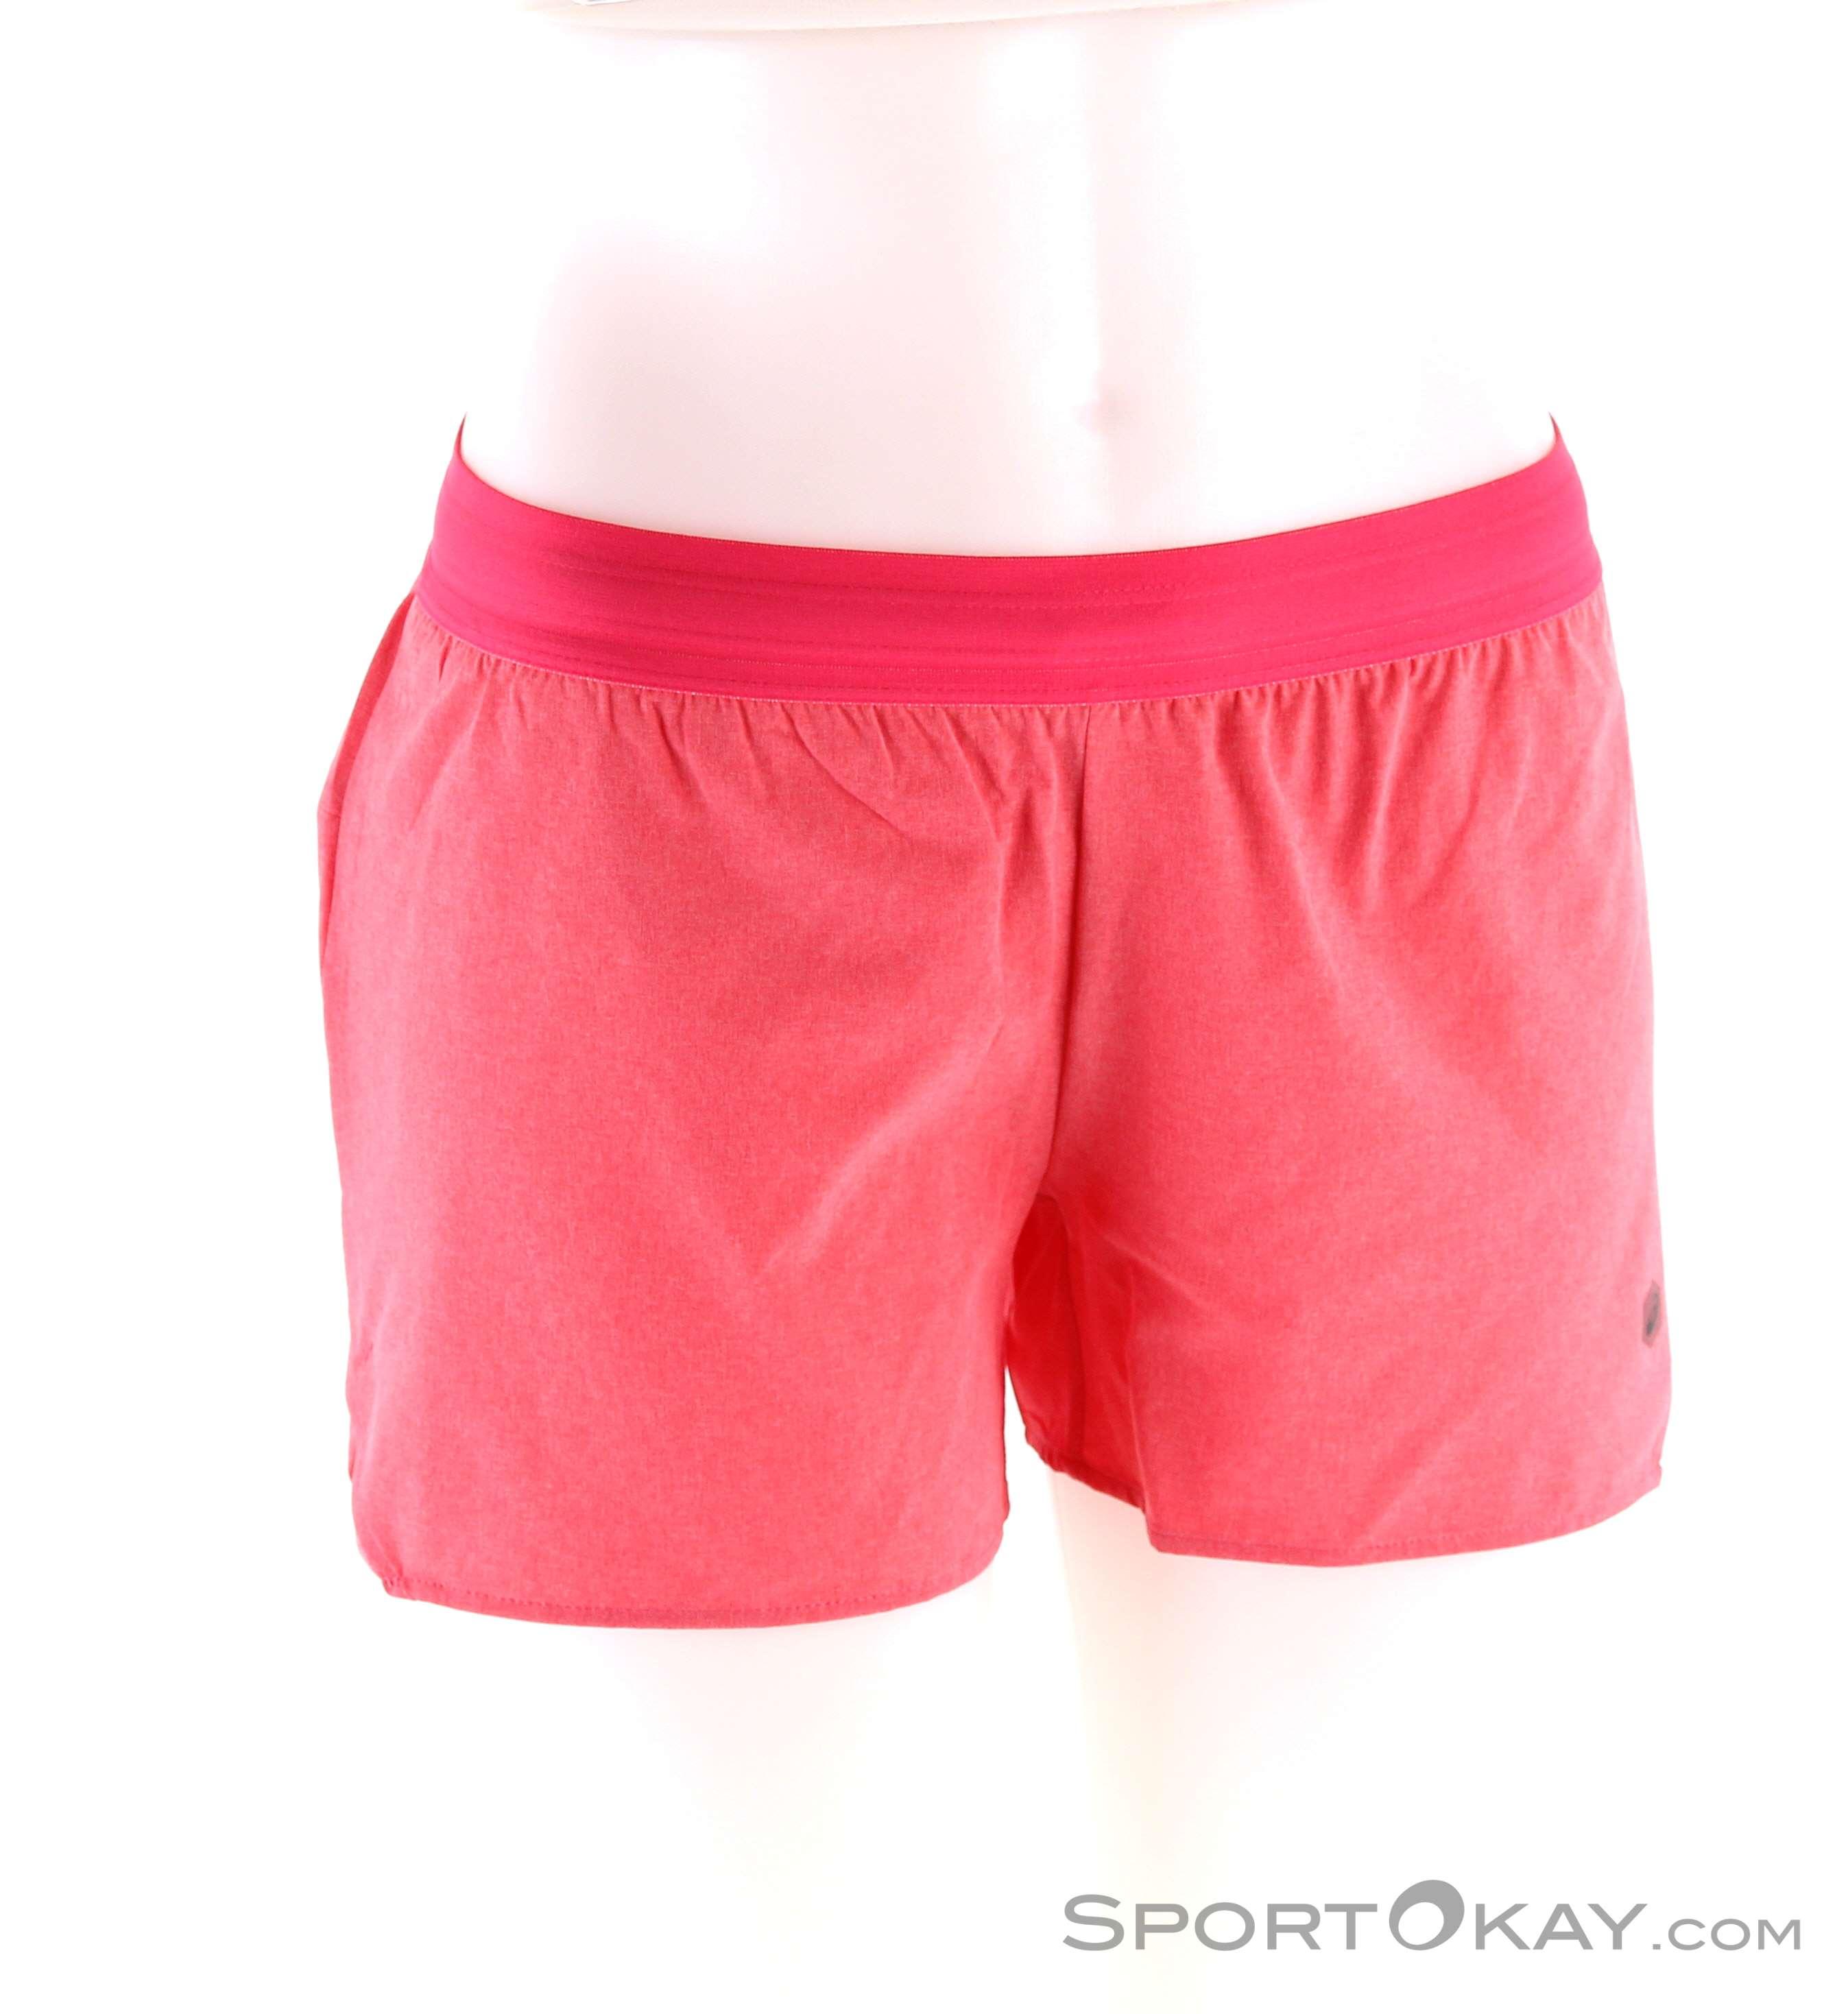 Asics Asics 3.5IN Short Woven Womens Running Shorts